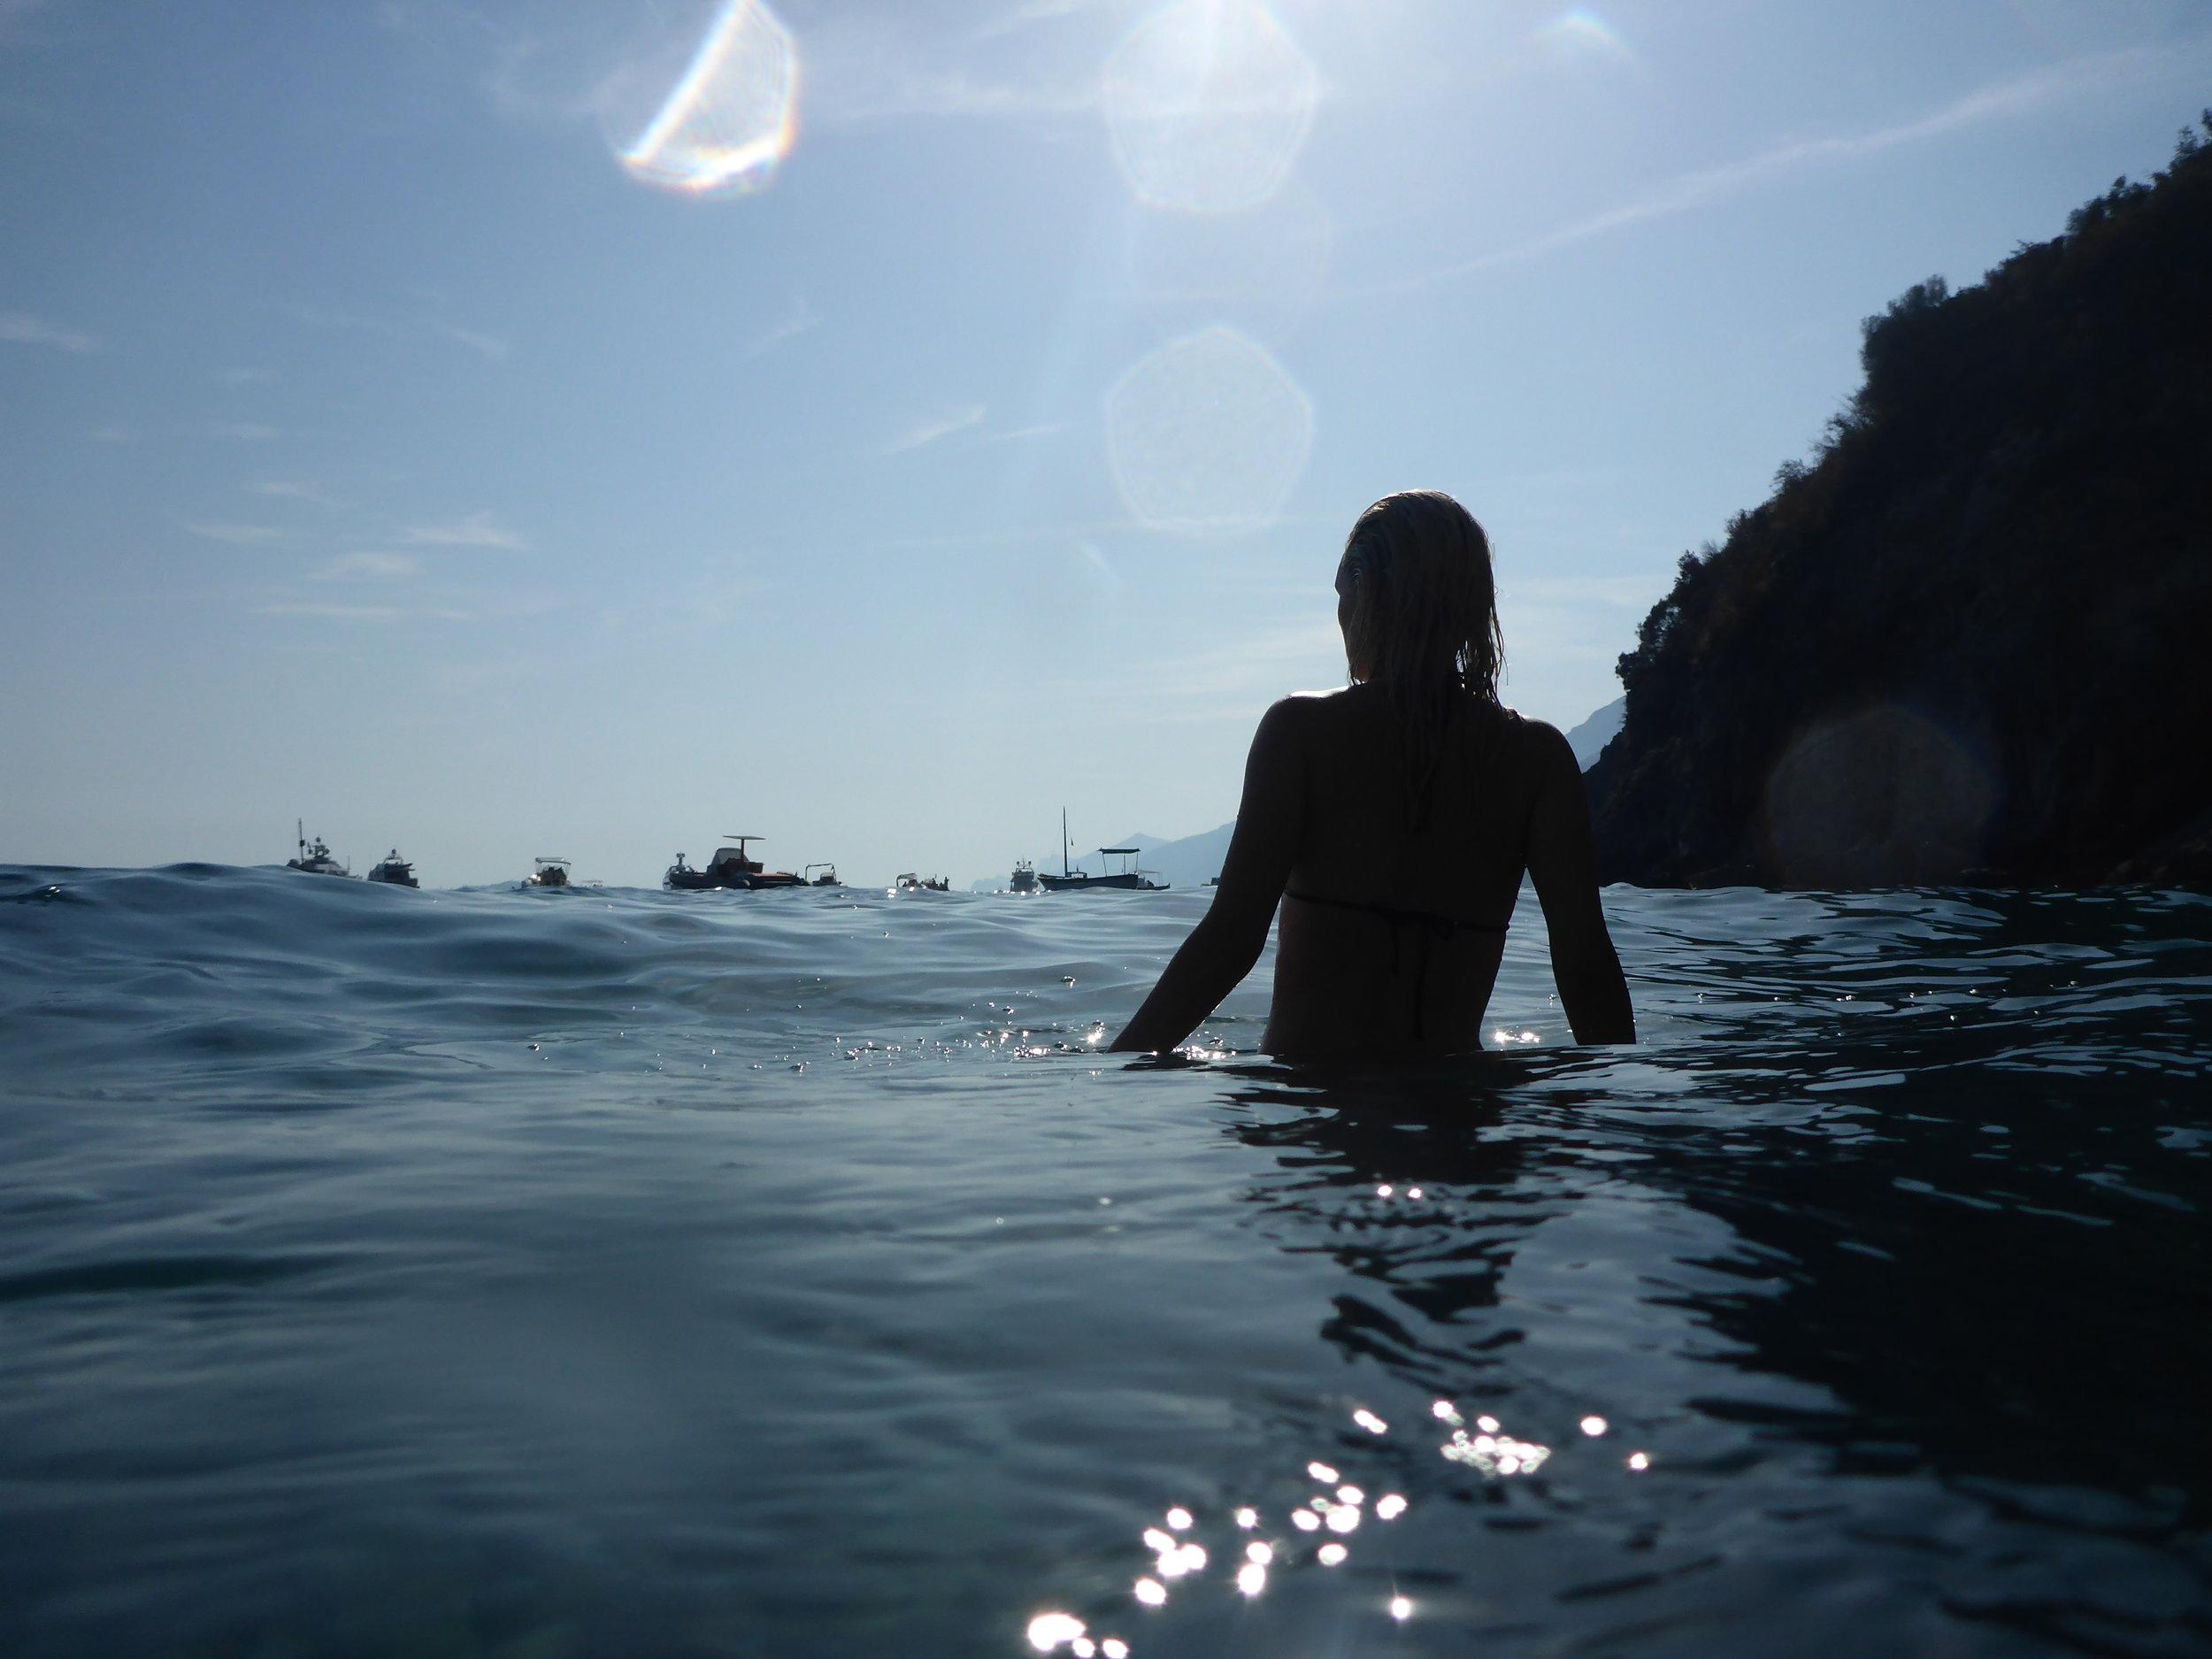 SWIMMING IN THE MEDITERRANEAN SEA